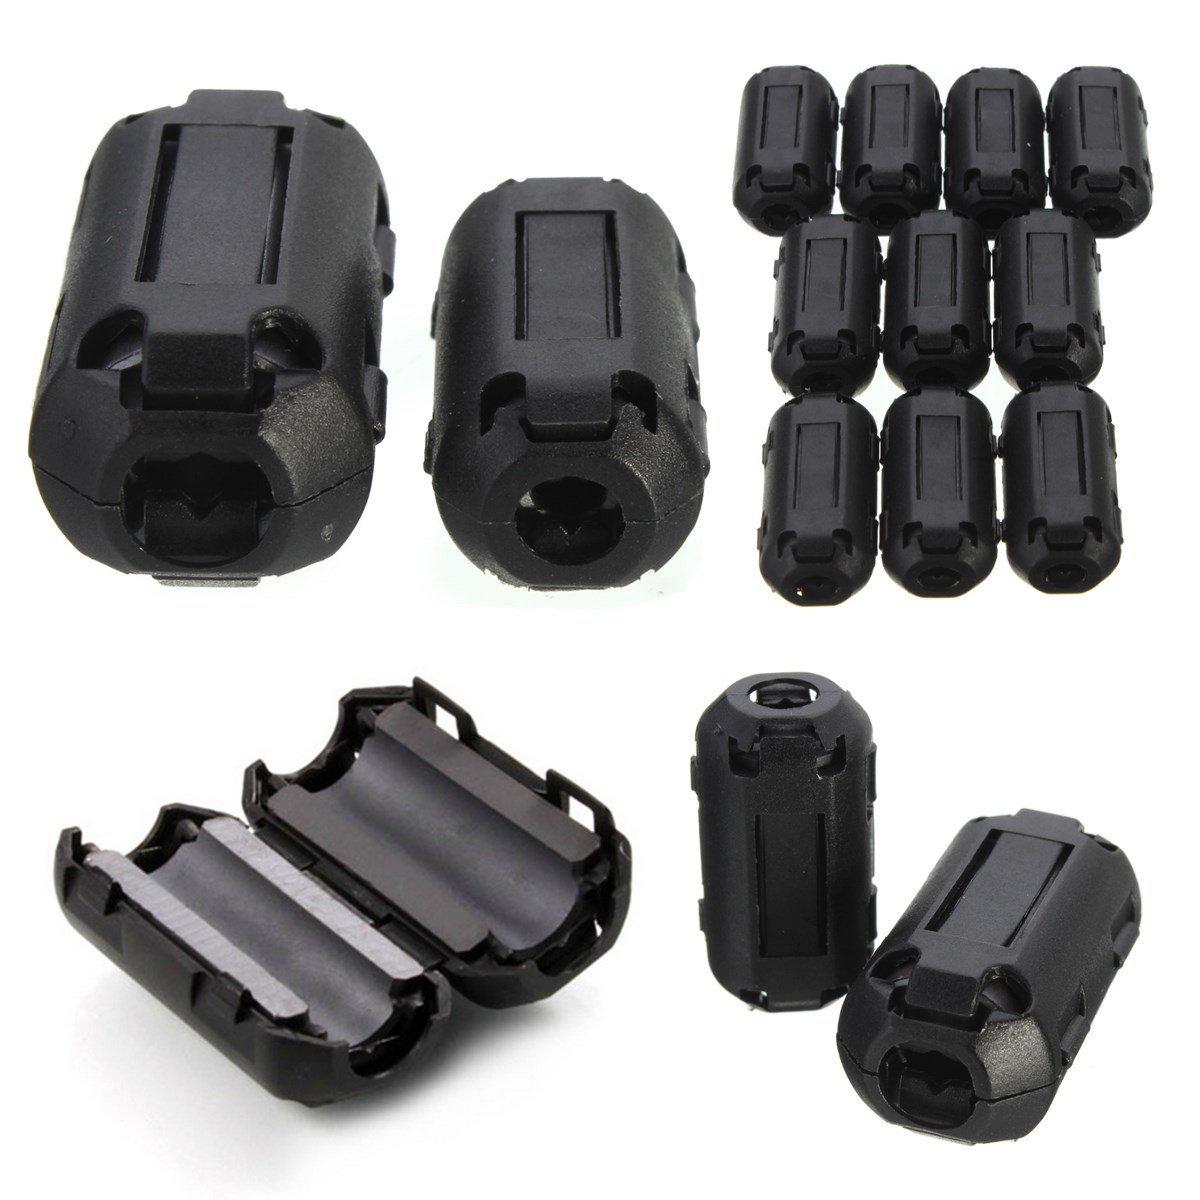 ZHENWOCAI 10Pcs Black EMI RFI Noise Ferrite Core Filter Cutting Noise on Cables 7mm New